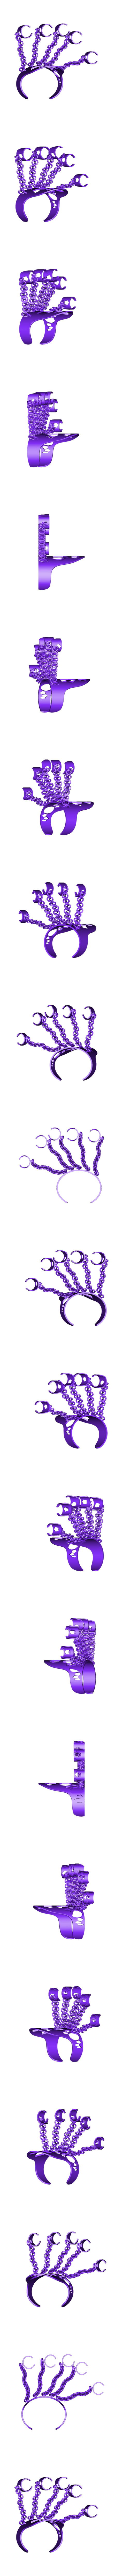 3d-fabric-jean-pierre_pentagothic_finger_handcuff.stl Download STL file pentagothic finger handcuff • Model to 3D print, 3d-fabric-jean-pierre